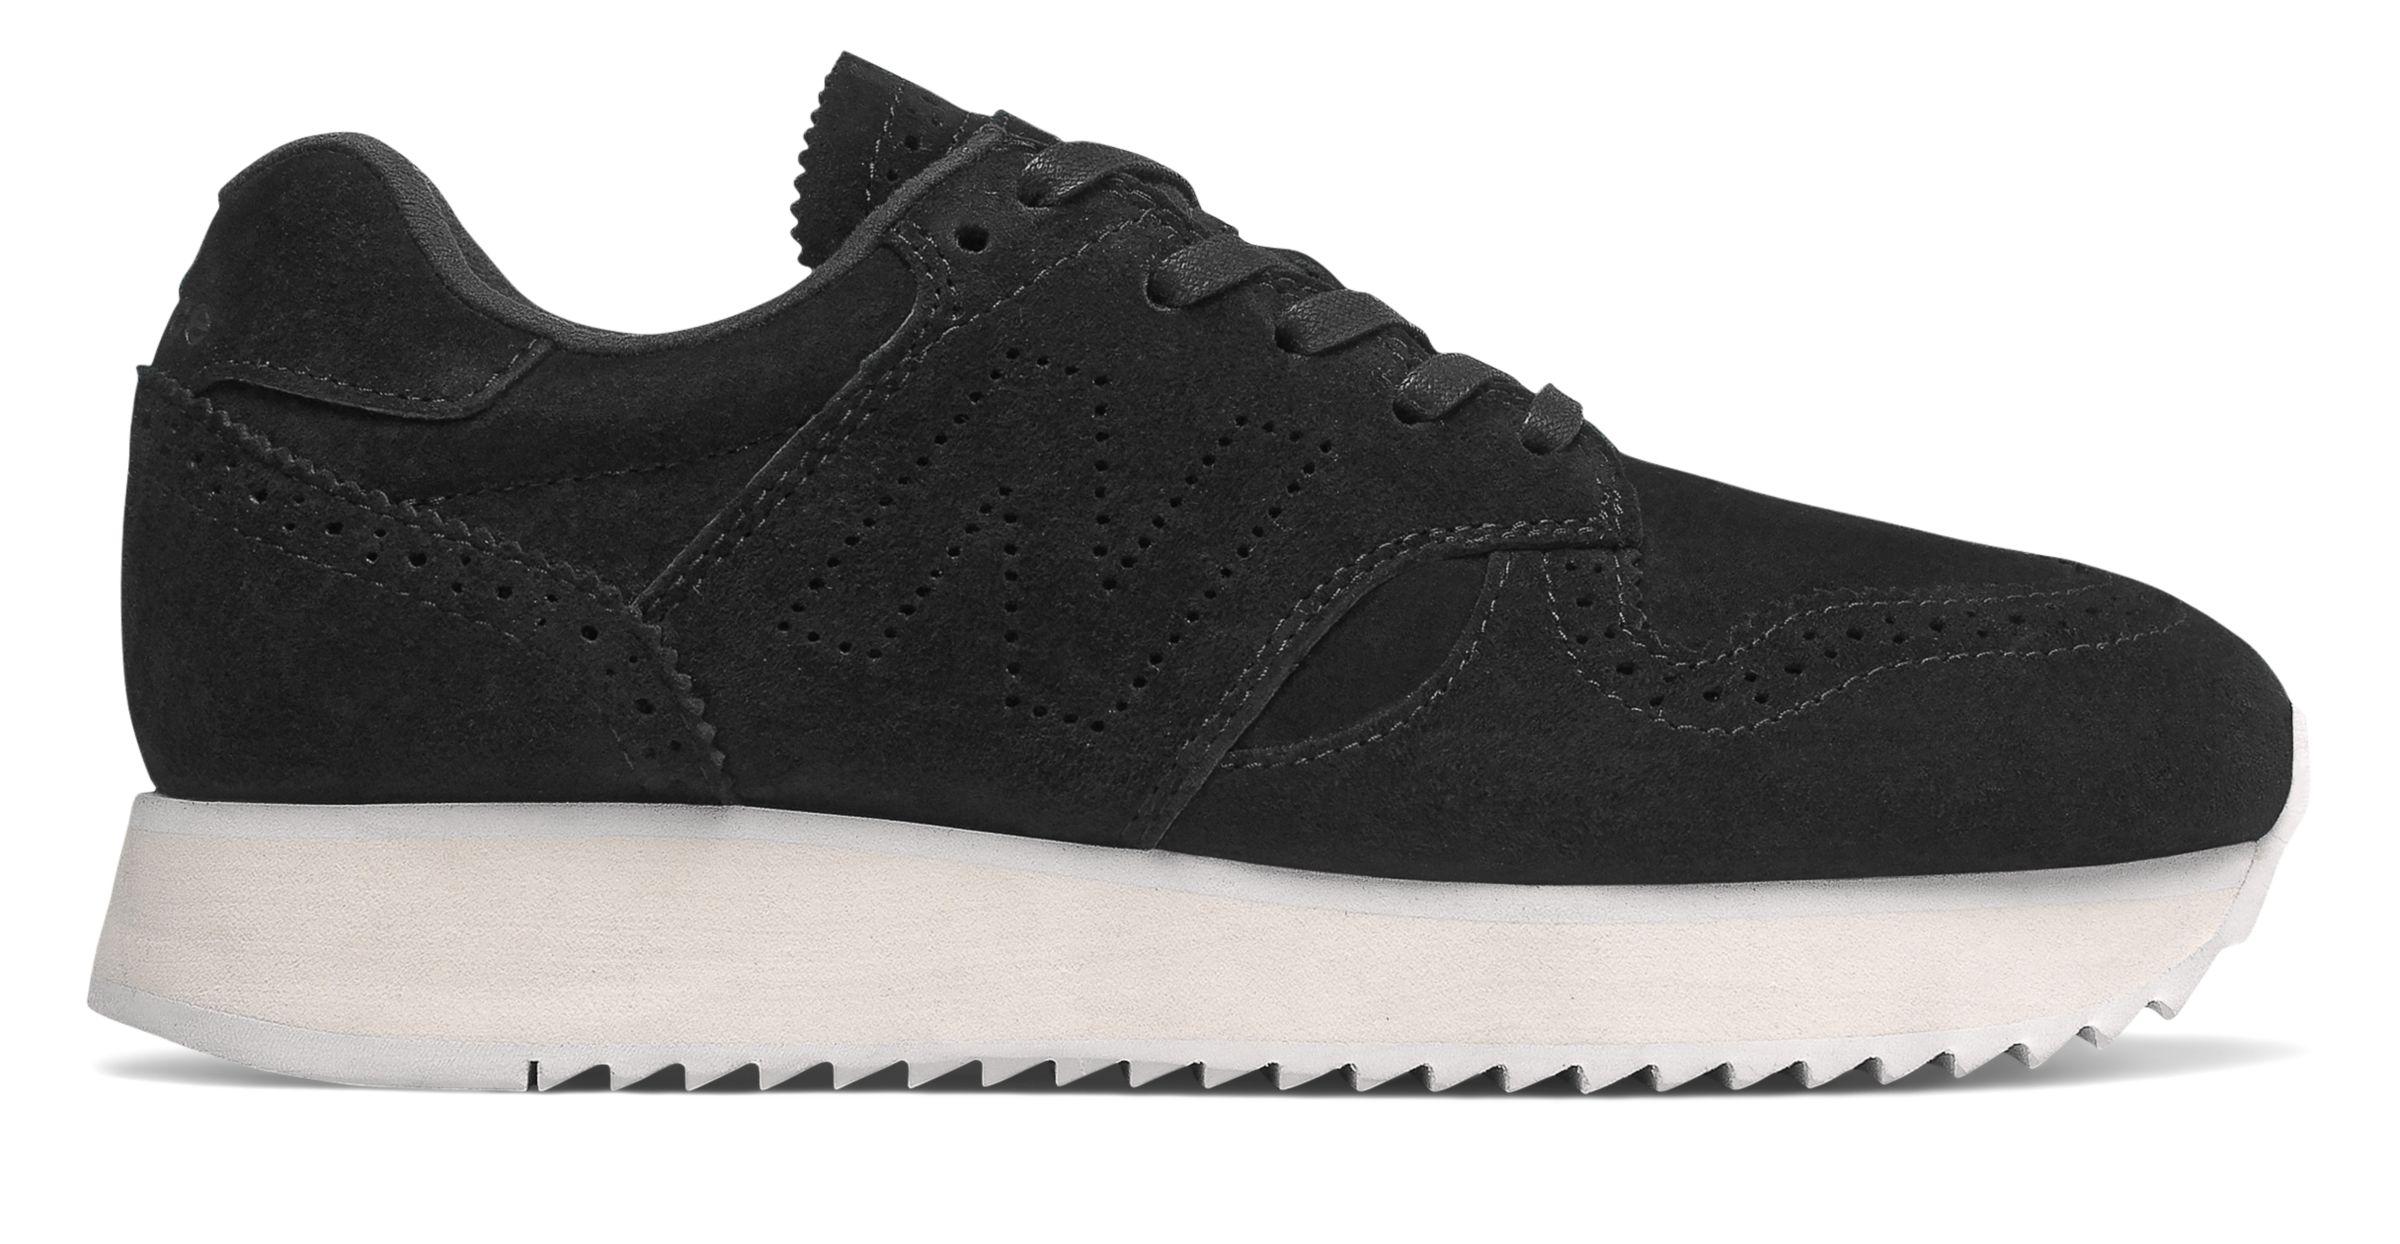 034845e0b37d New Balance Female Women s 520 Platform Lifestyle Shoes Black With ...